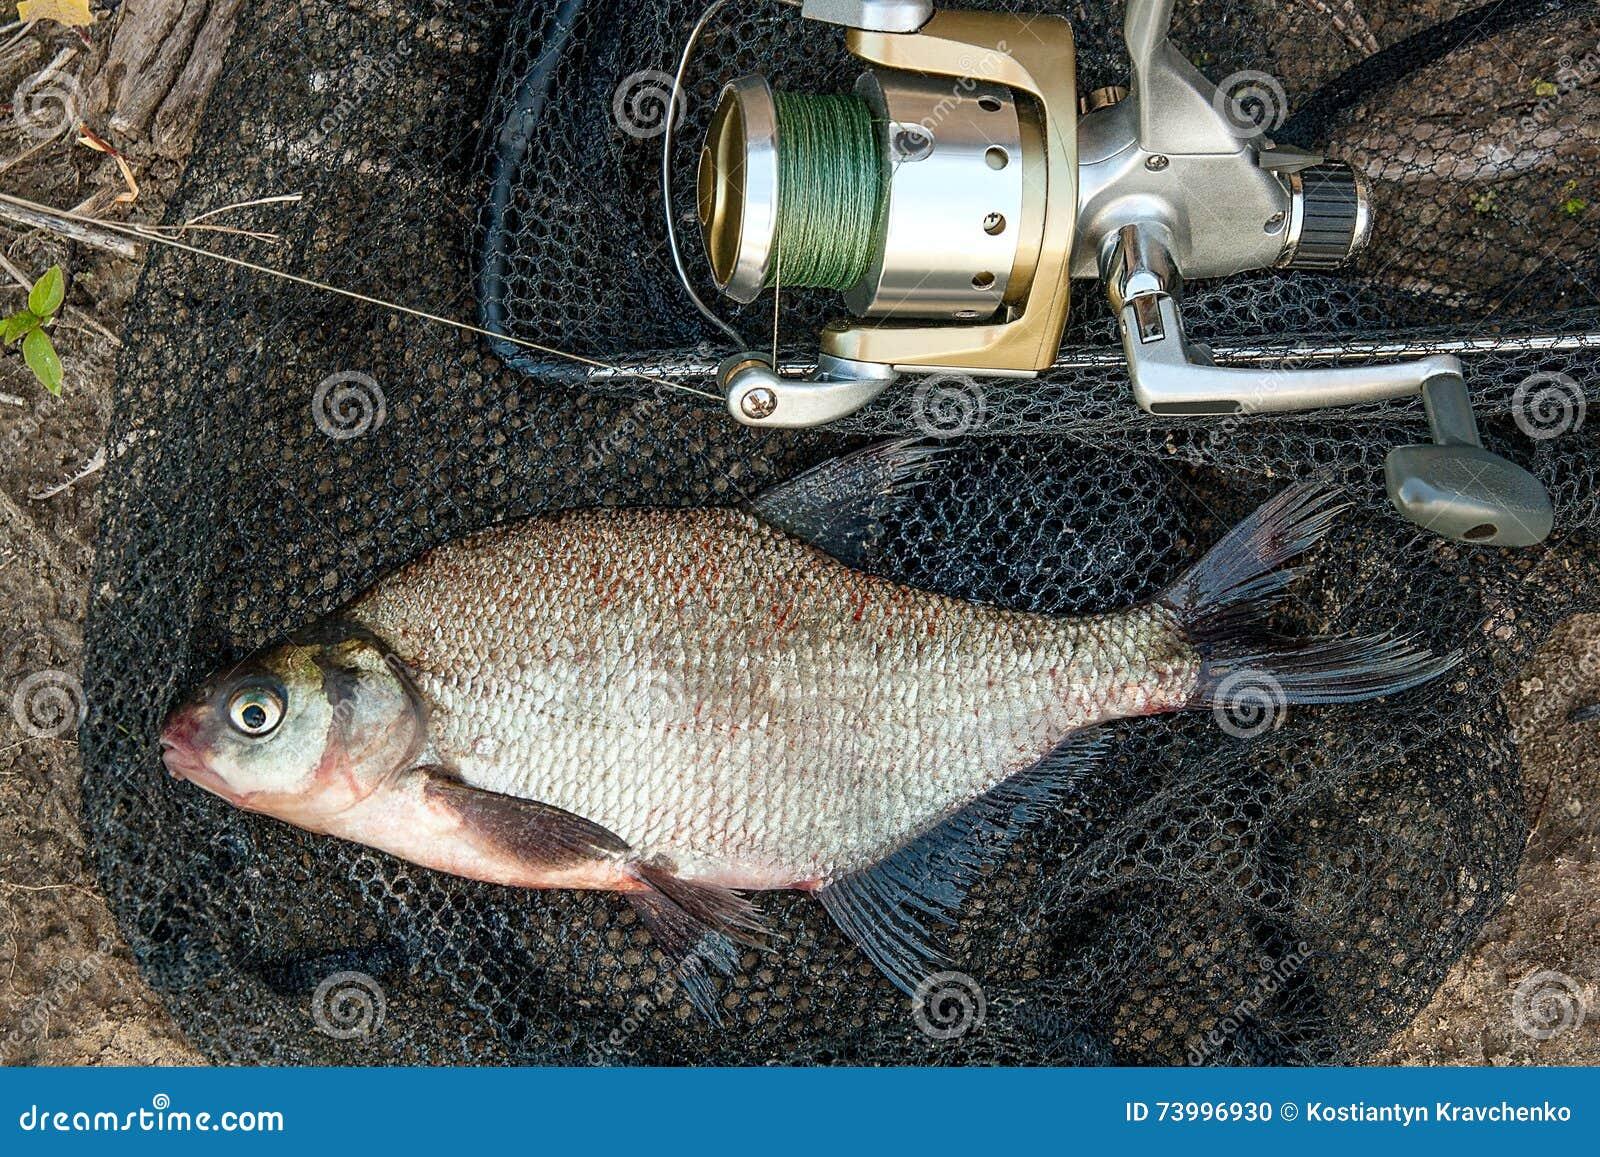 Freshwater fish bream - Common Bream Fish On Black Fishing Net Catching Freshwater Fish